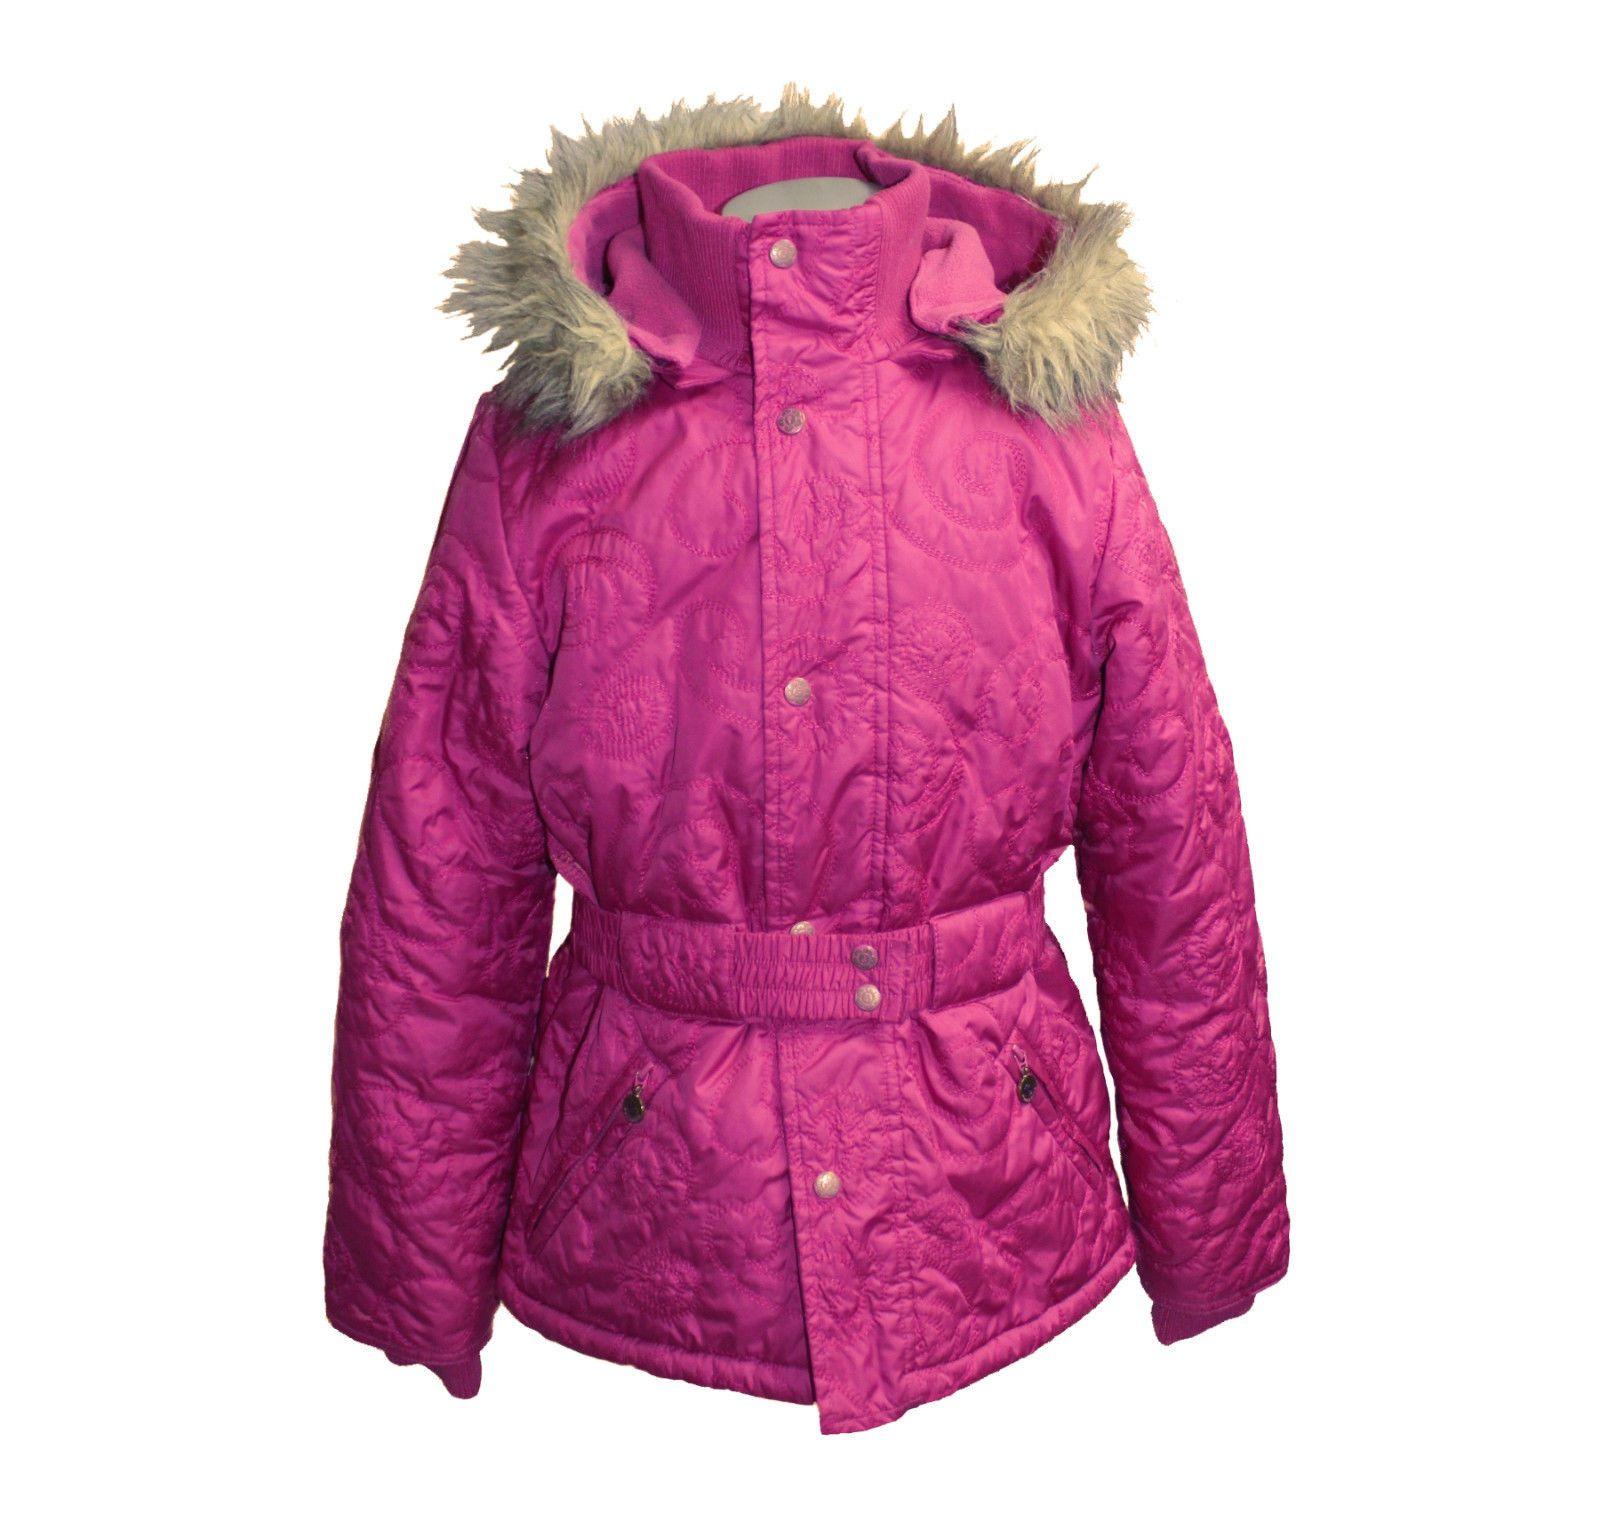 Pink 128 Pampolina Anorak Winterjacke Skijacke Mädchen Jacke UzMGSpjVLq